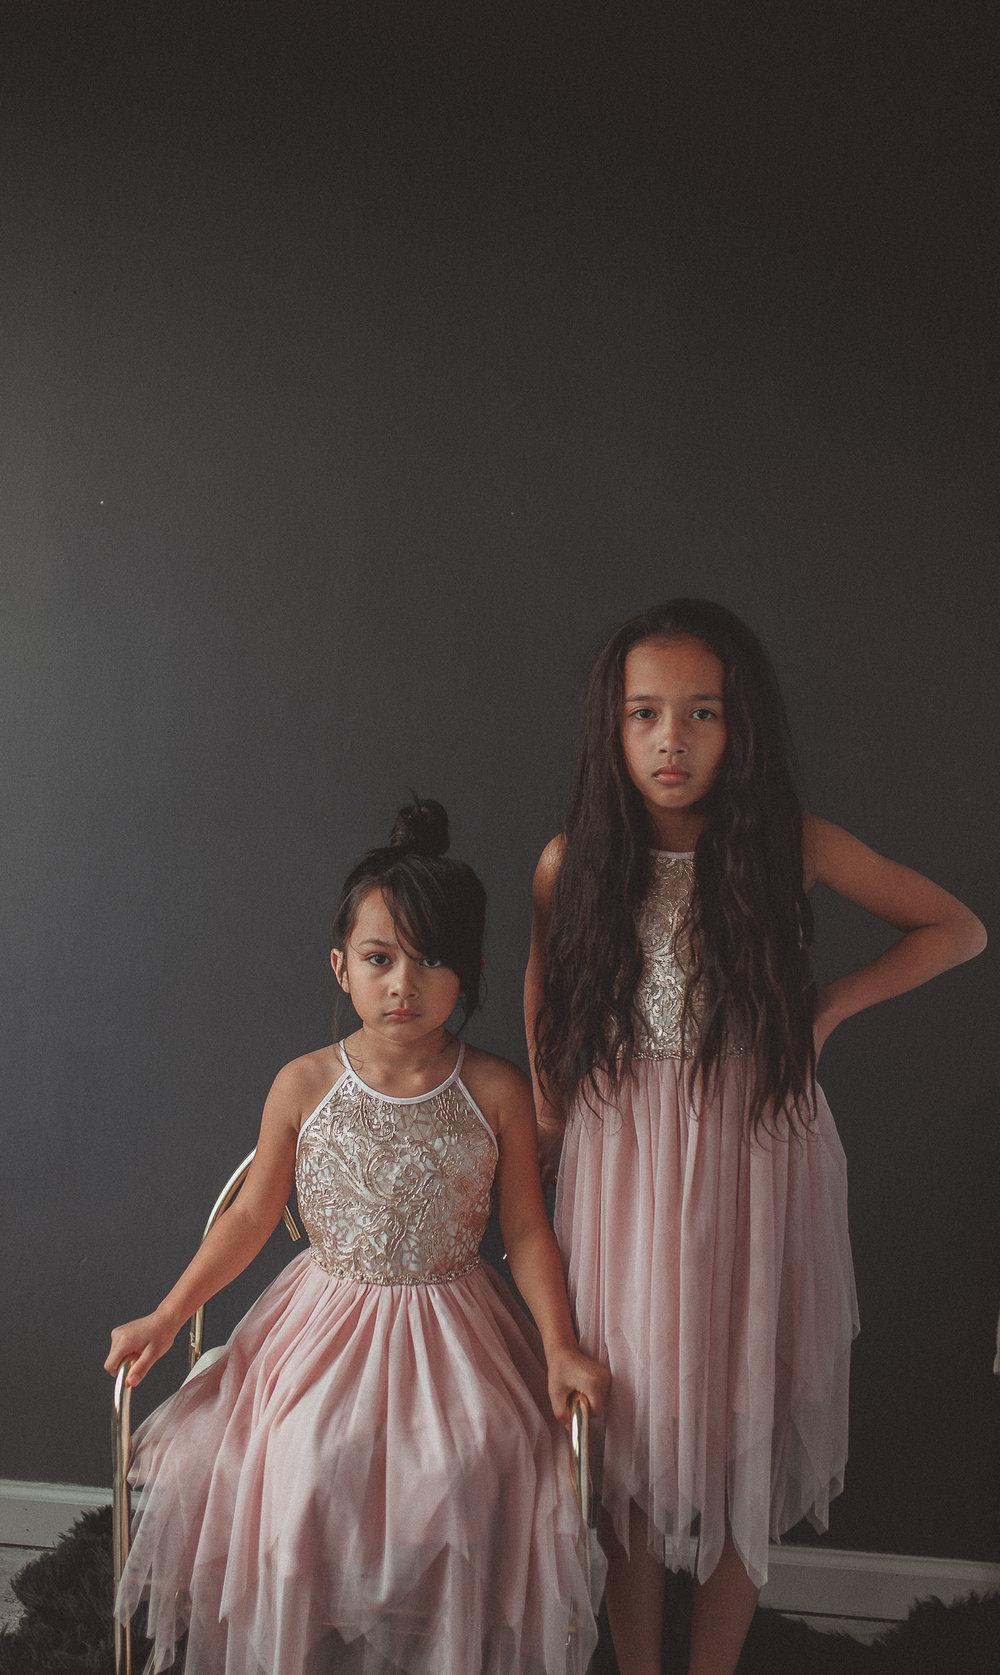 wallingford_children_portrait_photographer_10.jpg